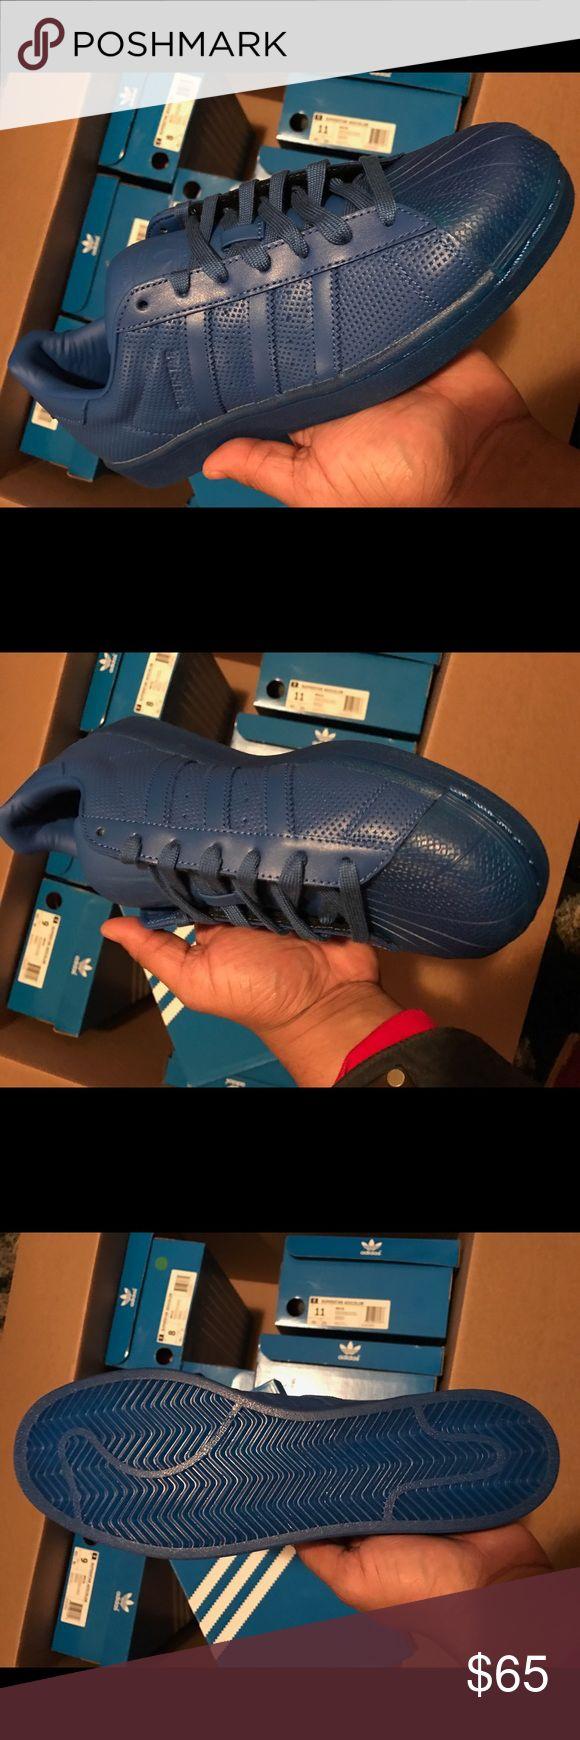 Men's Adidas Superstar Adicolor Brand New in Original Box !! 100% AUTHENTIC !! Adidas Shoes Sneakers